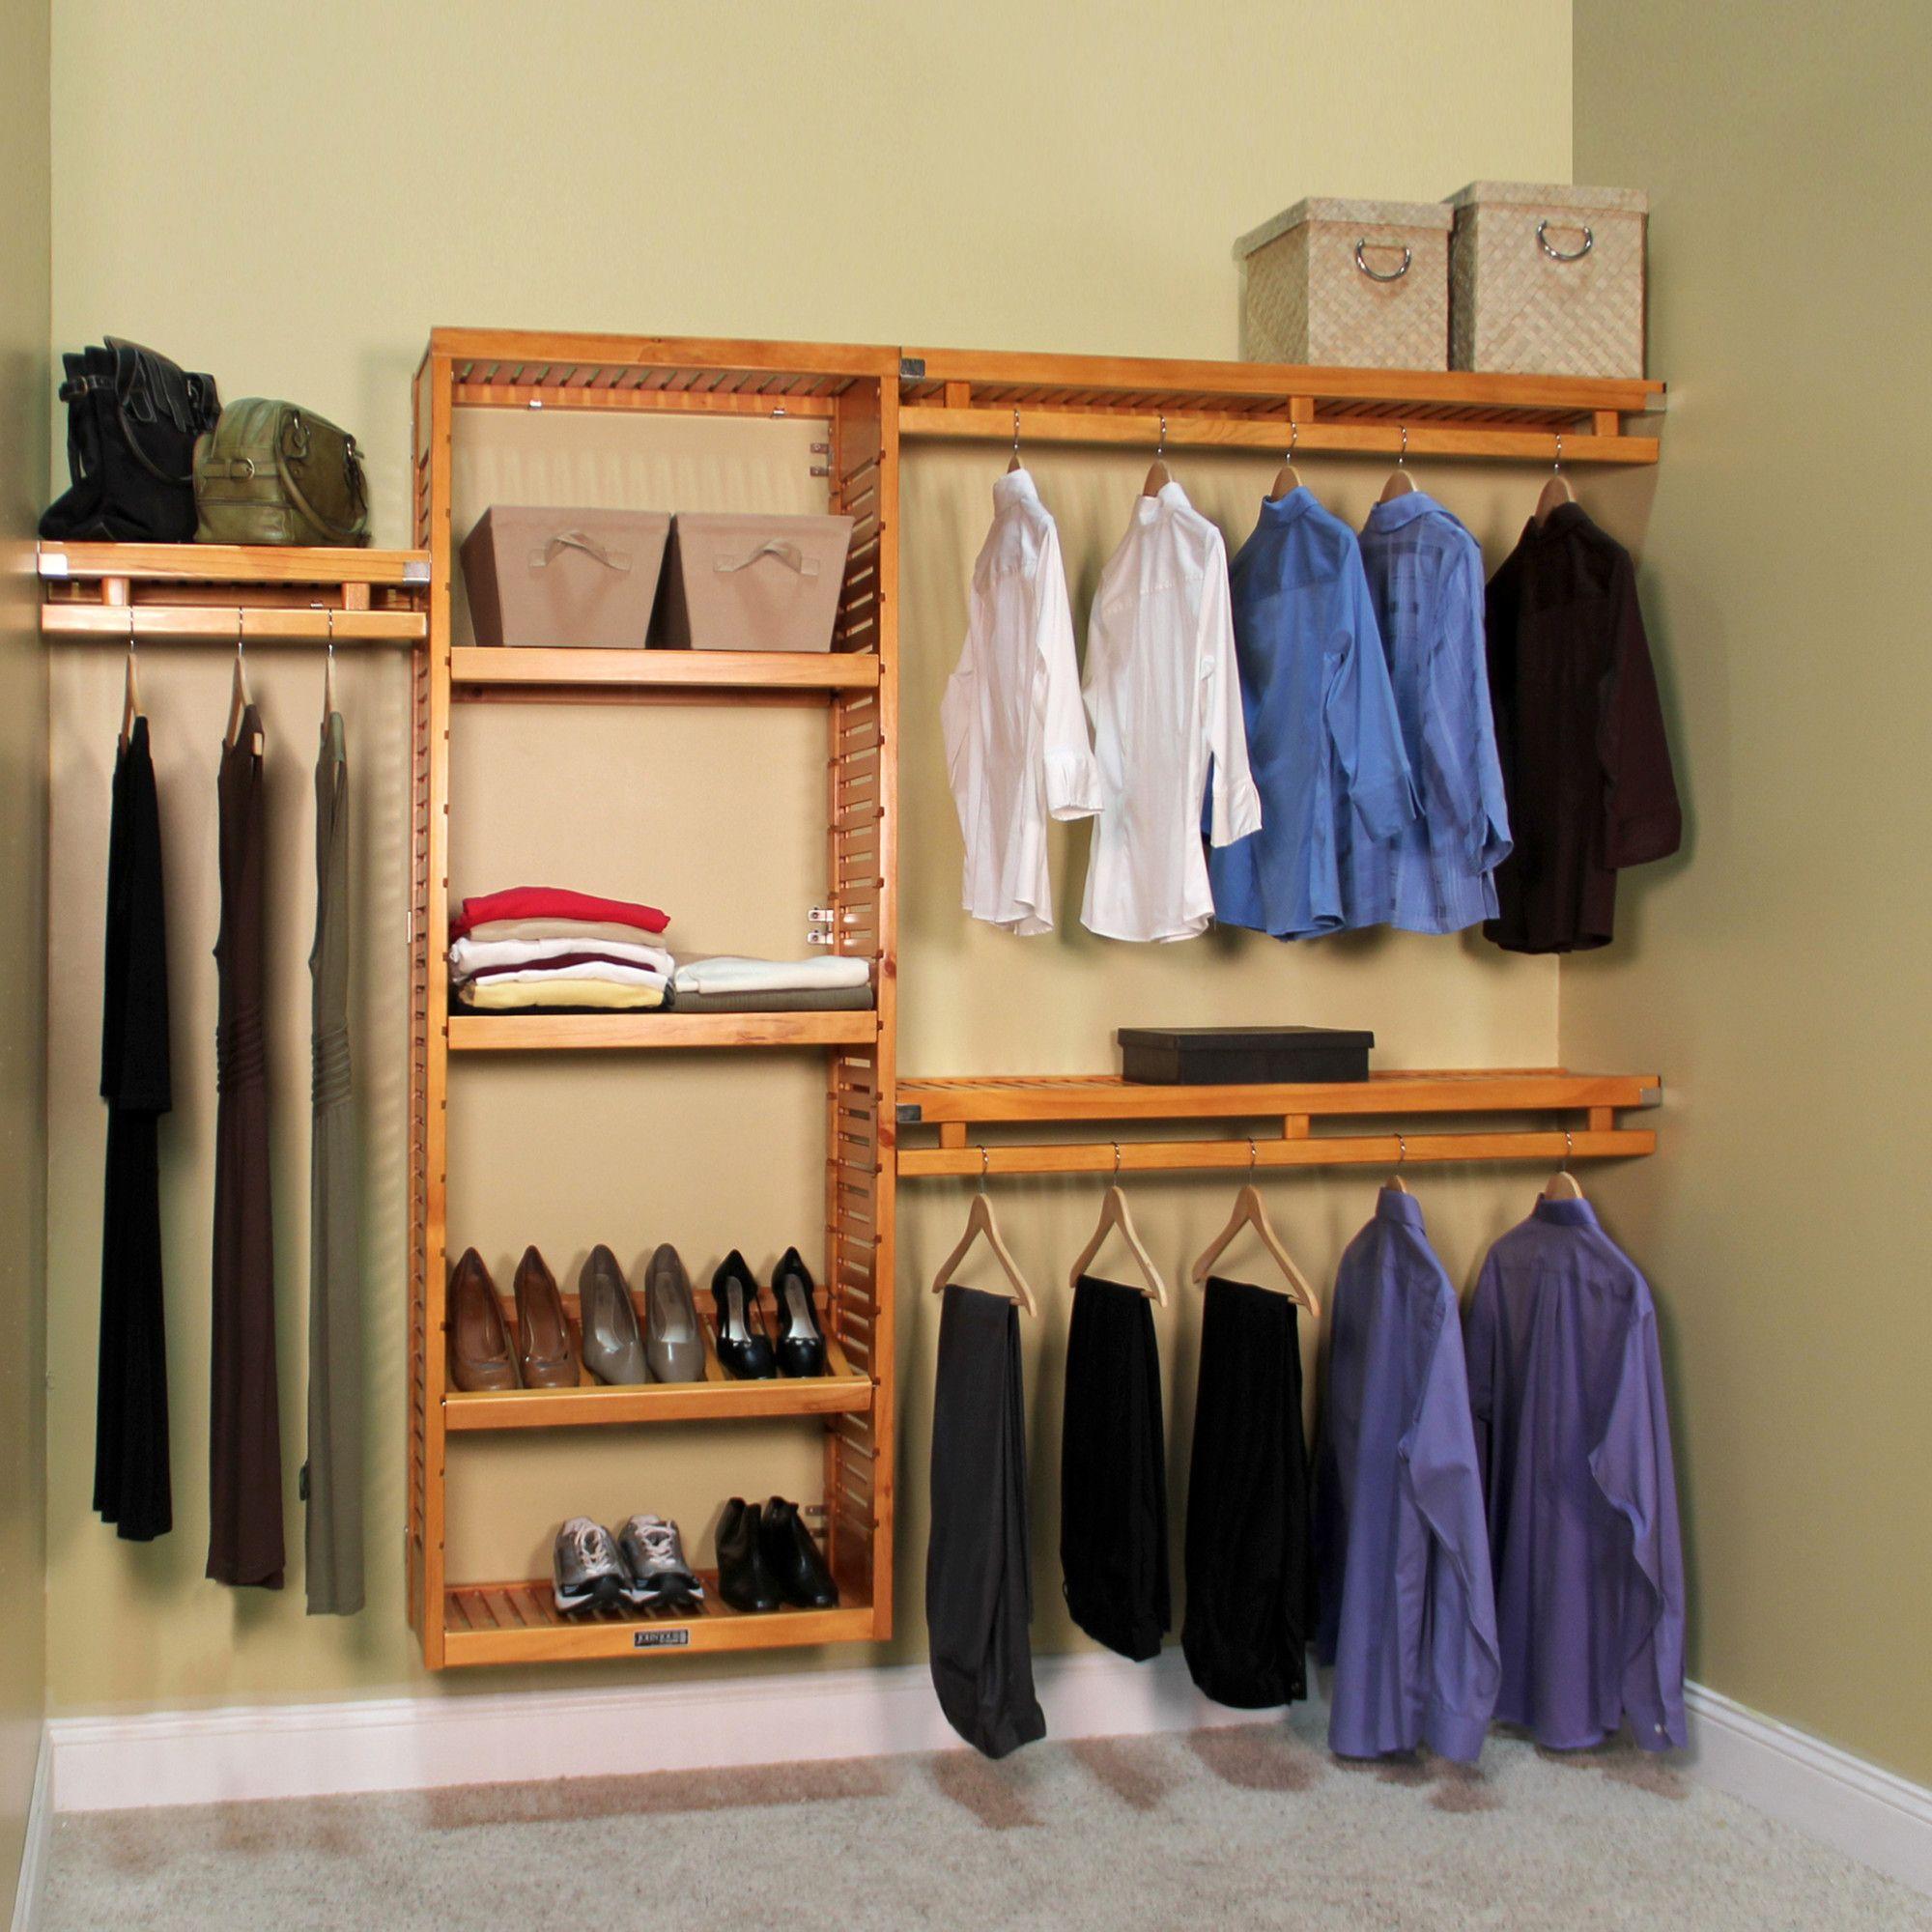 96 w 120w deep solid wood simplicity closet system